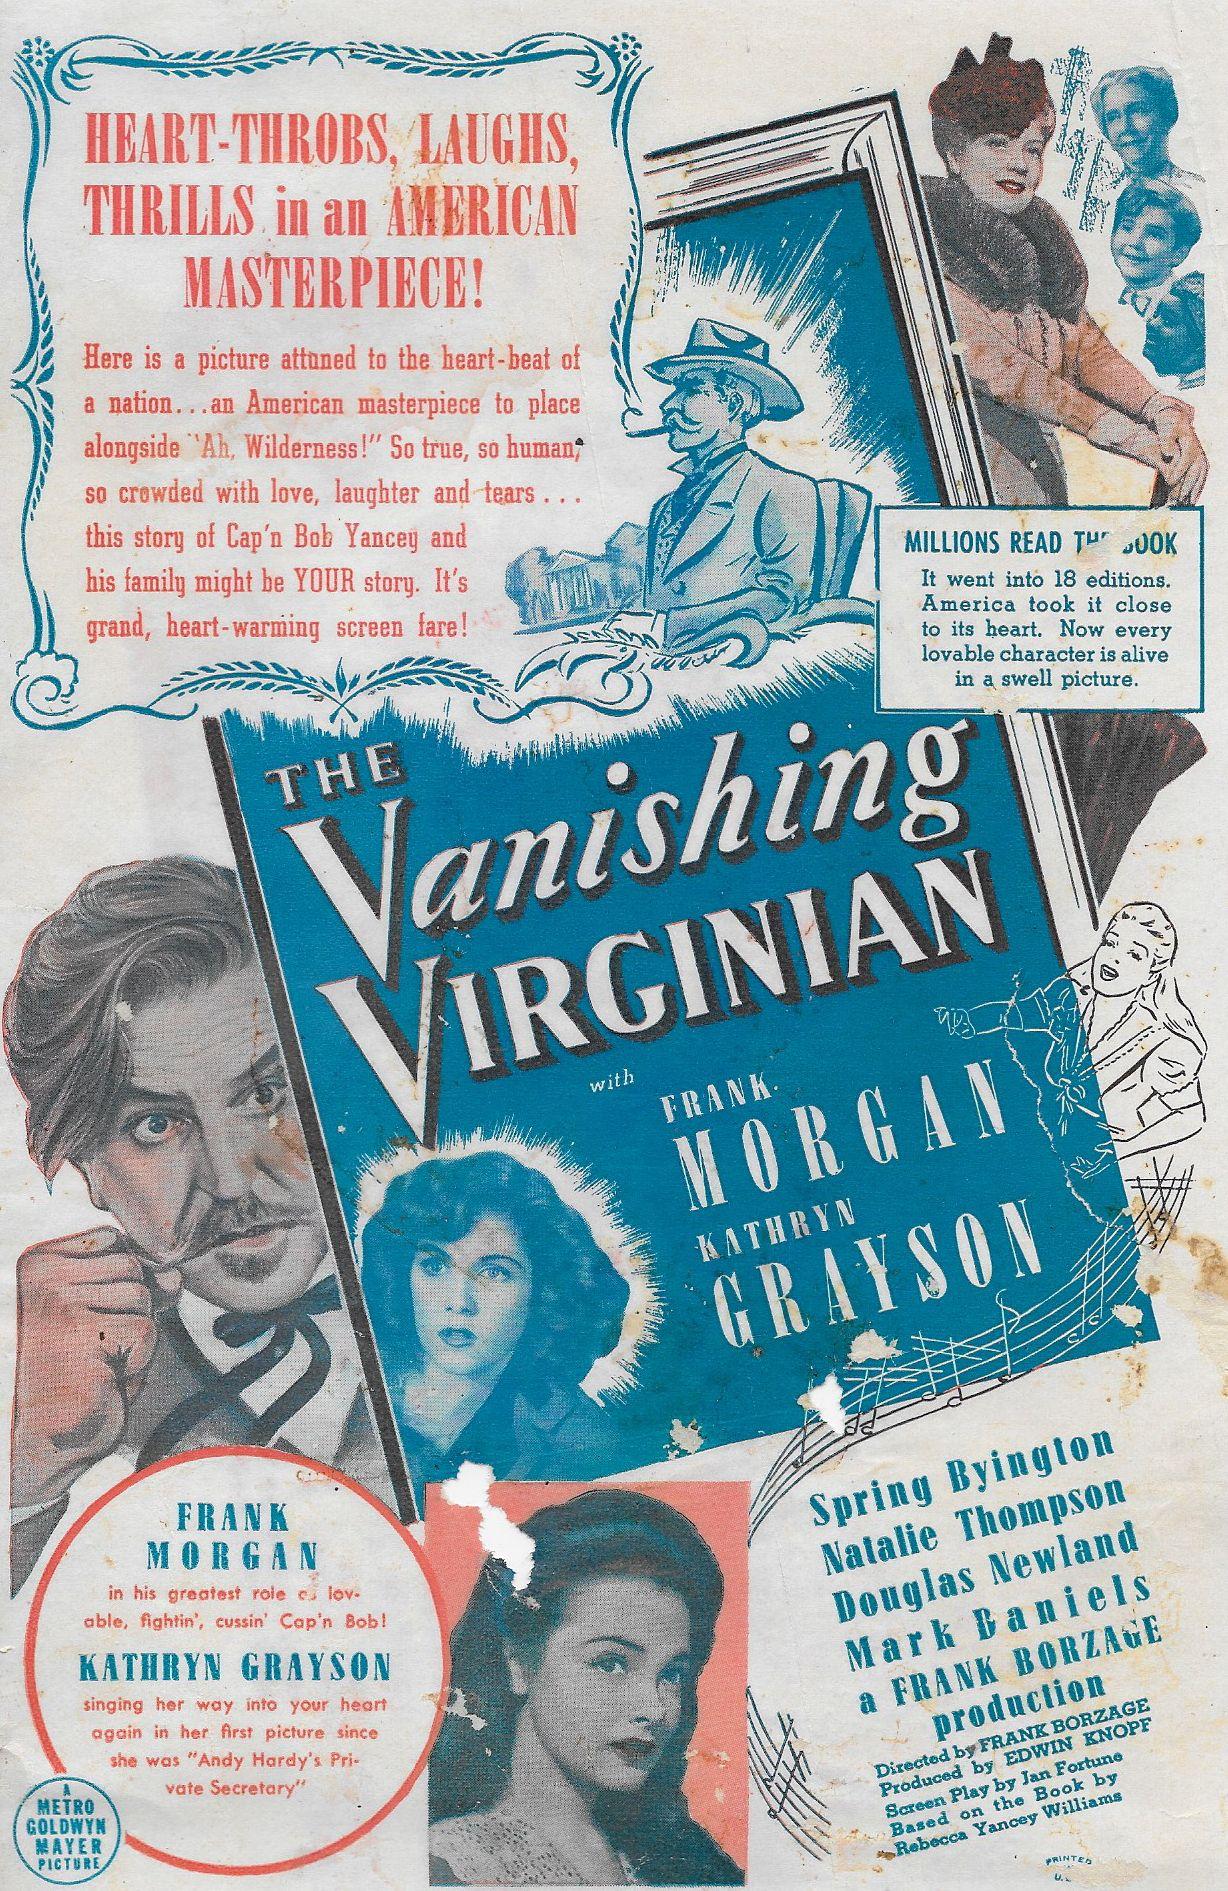 Spring Byington, Louise Beavers, Kathryn Grayson, Dickie Jones, Frank Morgan, Elizabeth Patterson, and Natalie Thompson in The Vanishing Virginian (1942)